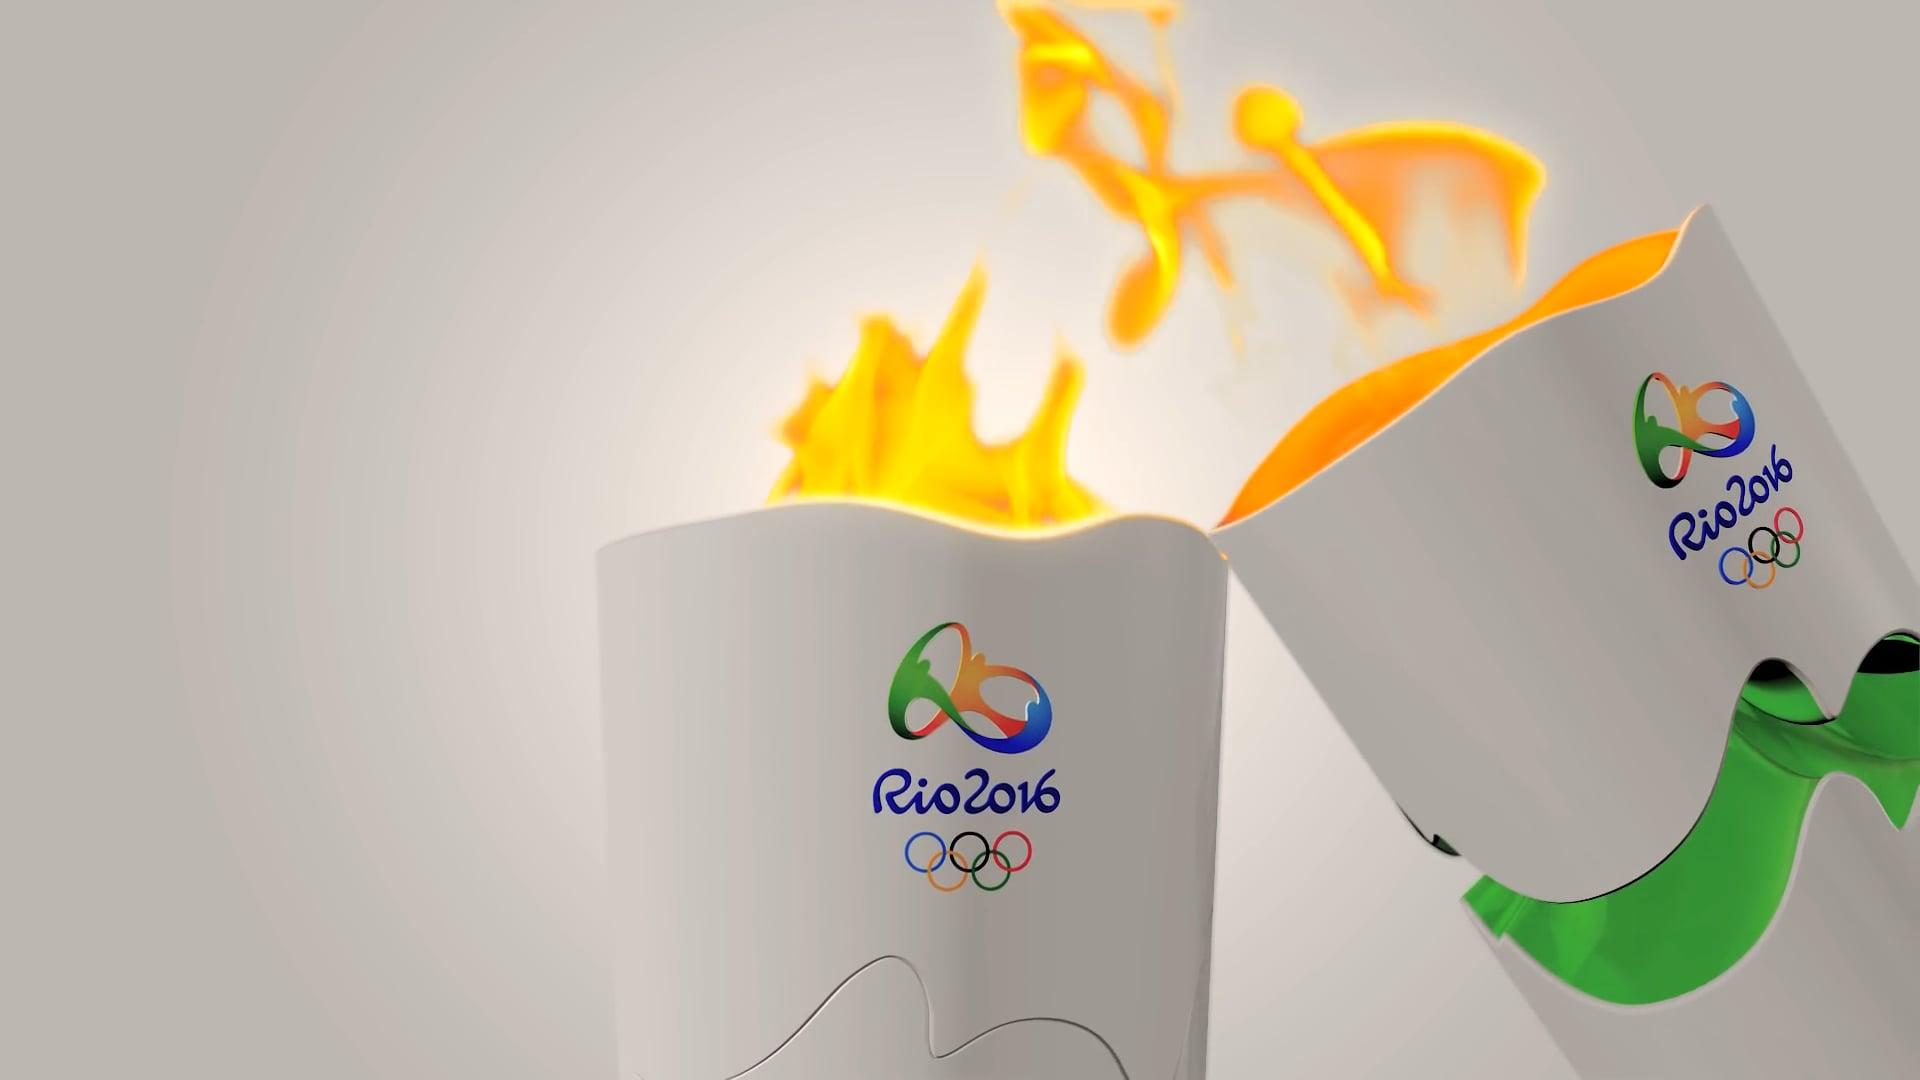 Tocha Olímpica   Olympic Torch - Rio 2016